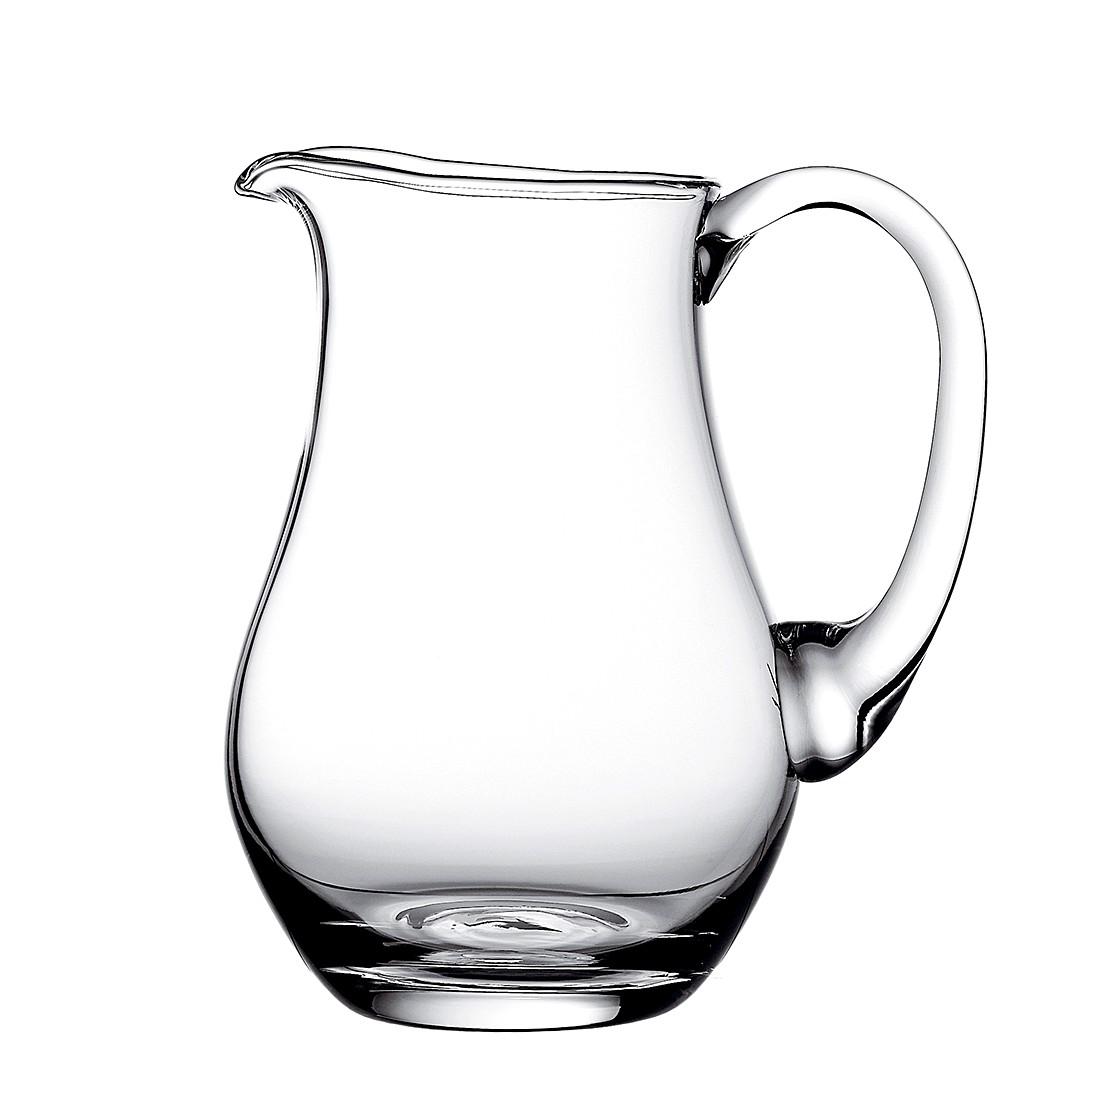 Krug (1000 ml) Polo, WMF günstig